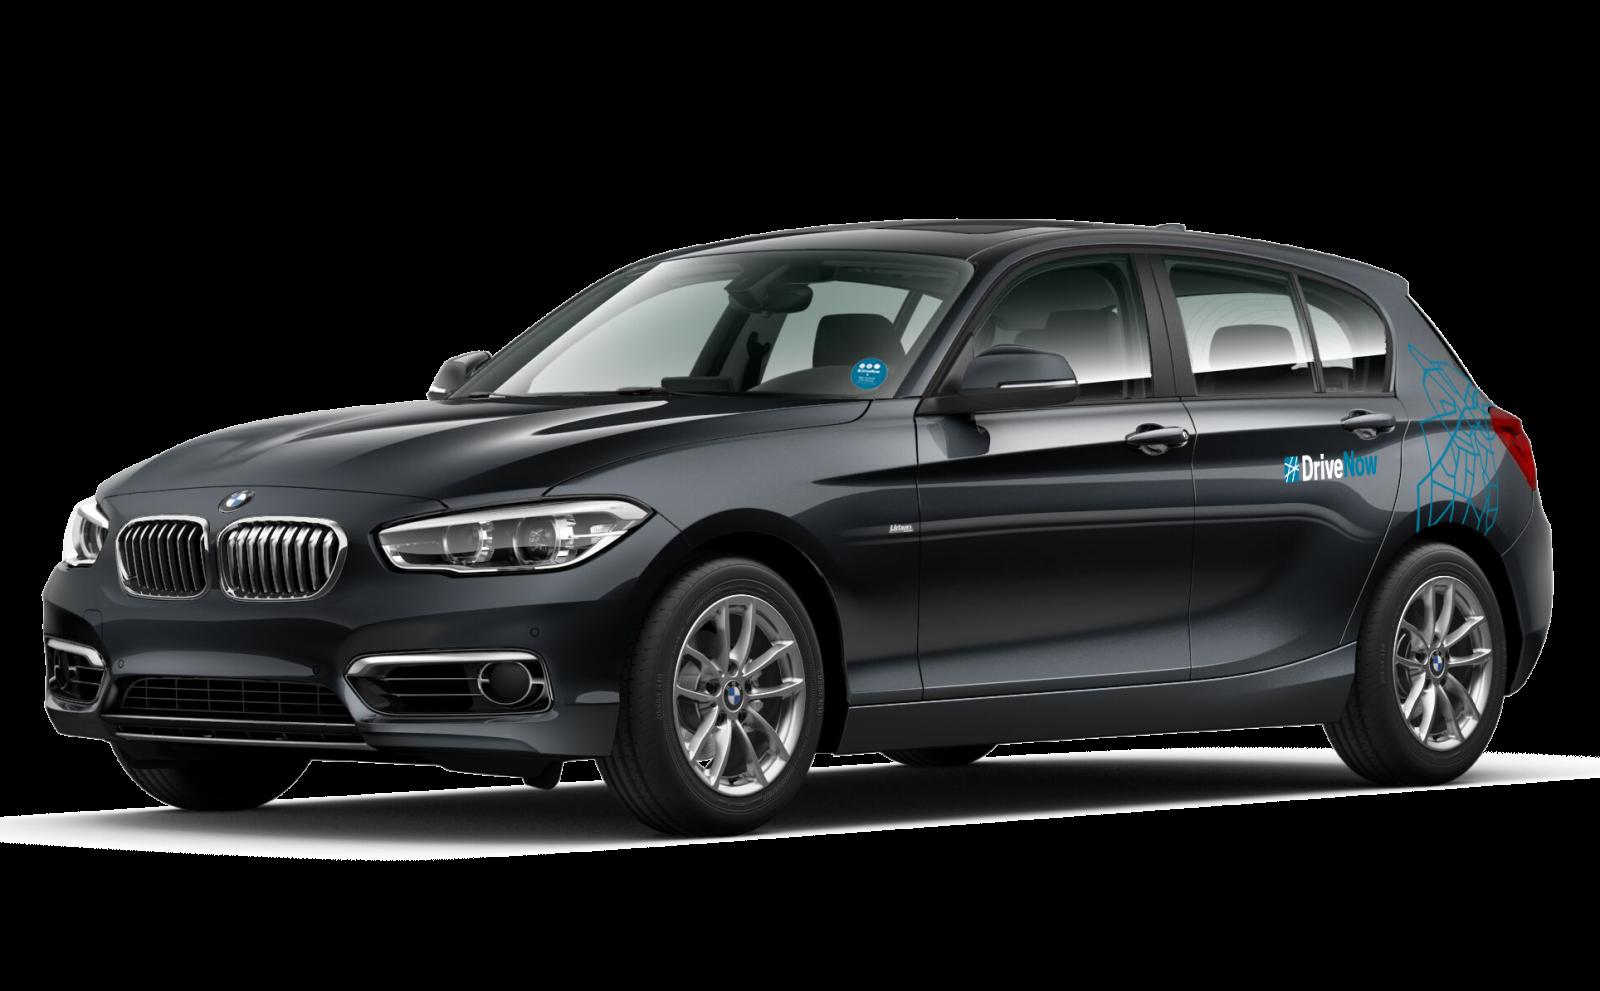 DriveNow_BMW_1SeriesLCI_Silhouette_Transvers_MineralGrey (2)_12